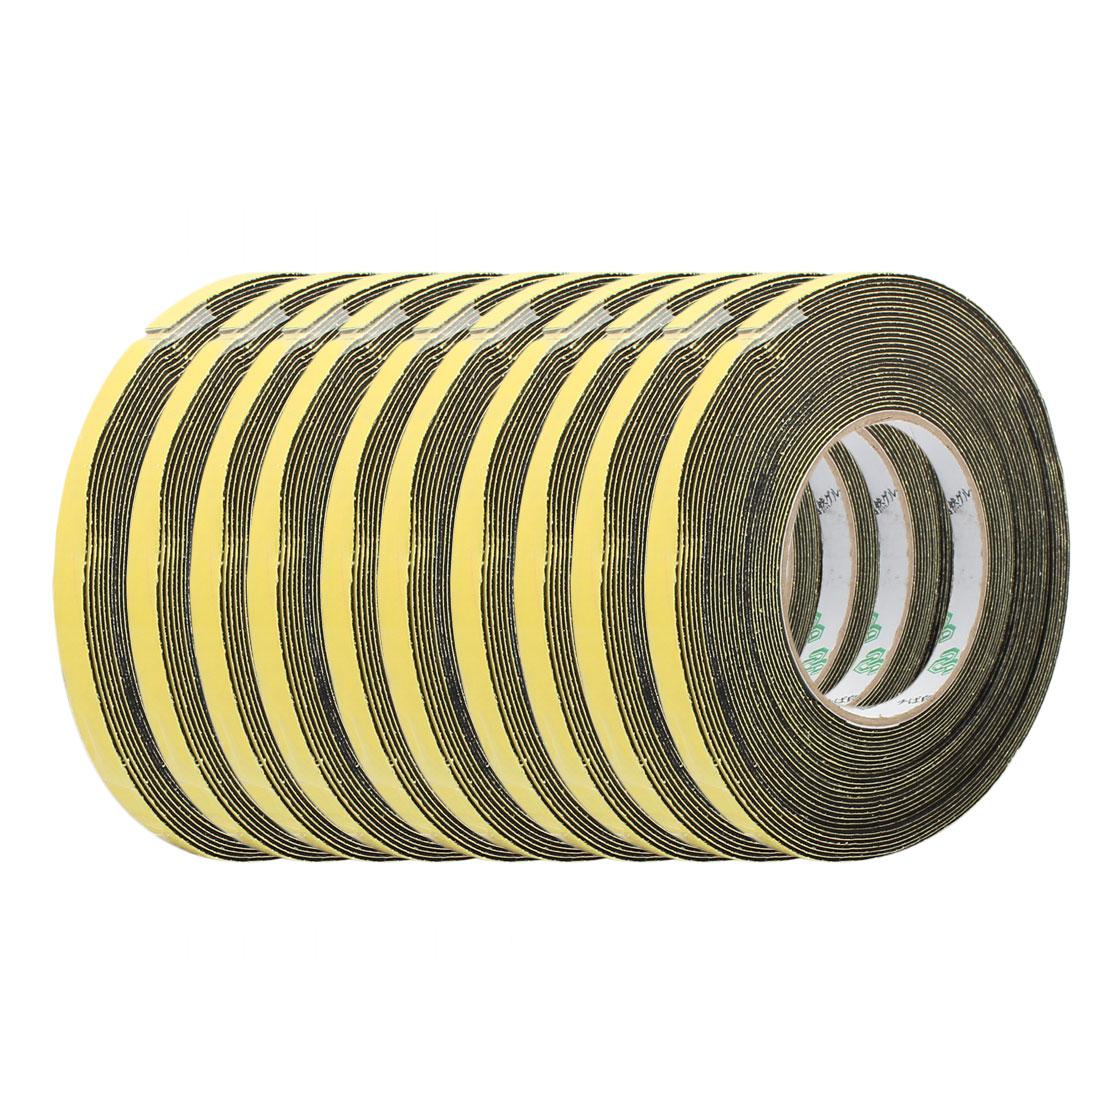 10Pcs 10mm Width 1mm Thickness Single Side Sponge Foam Tape Black 10M Length - image 4 of 4